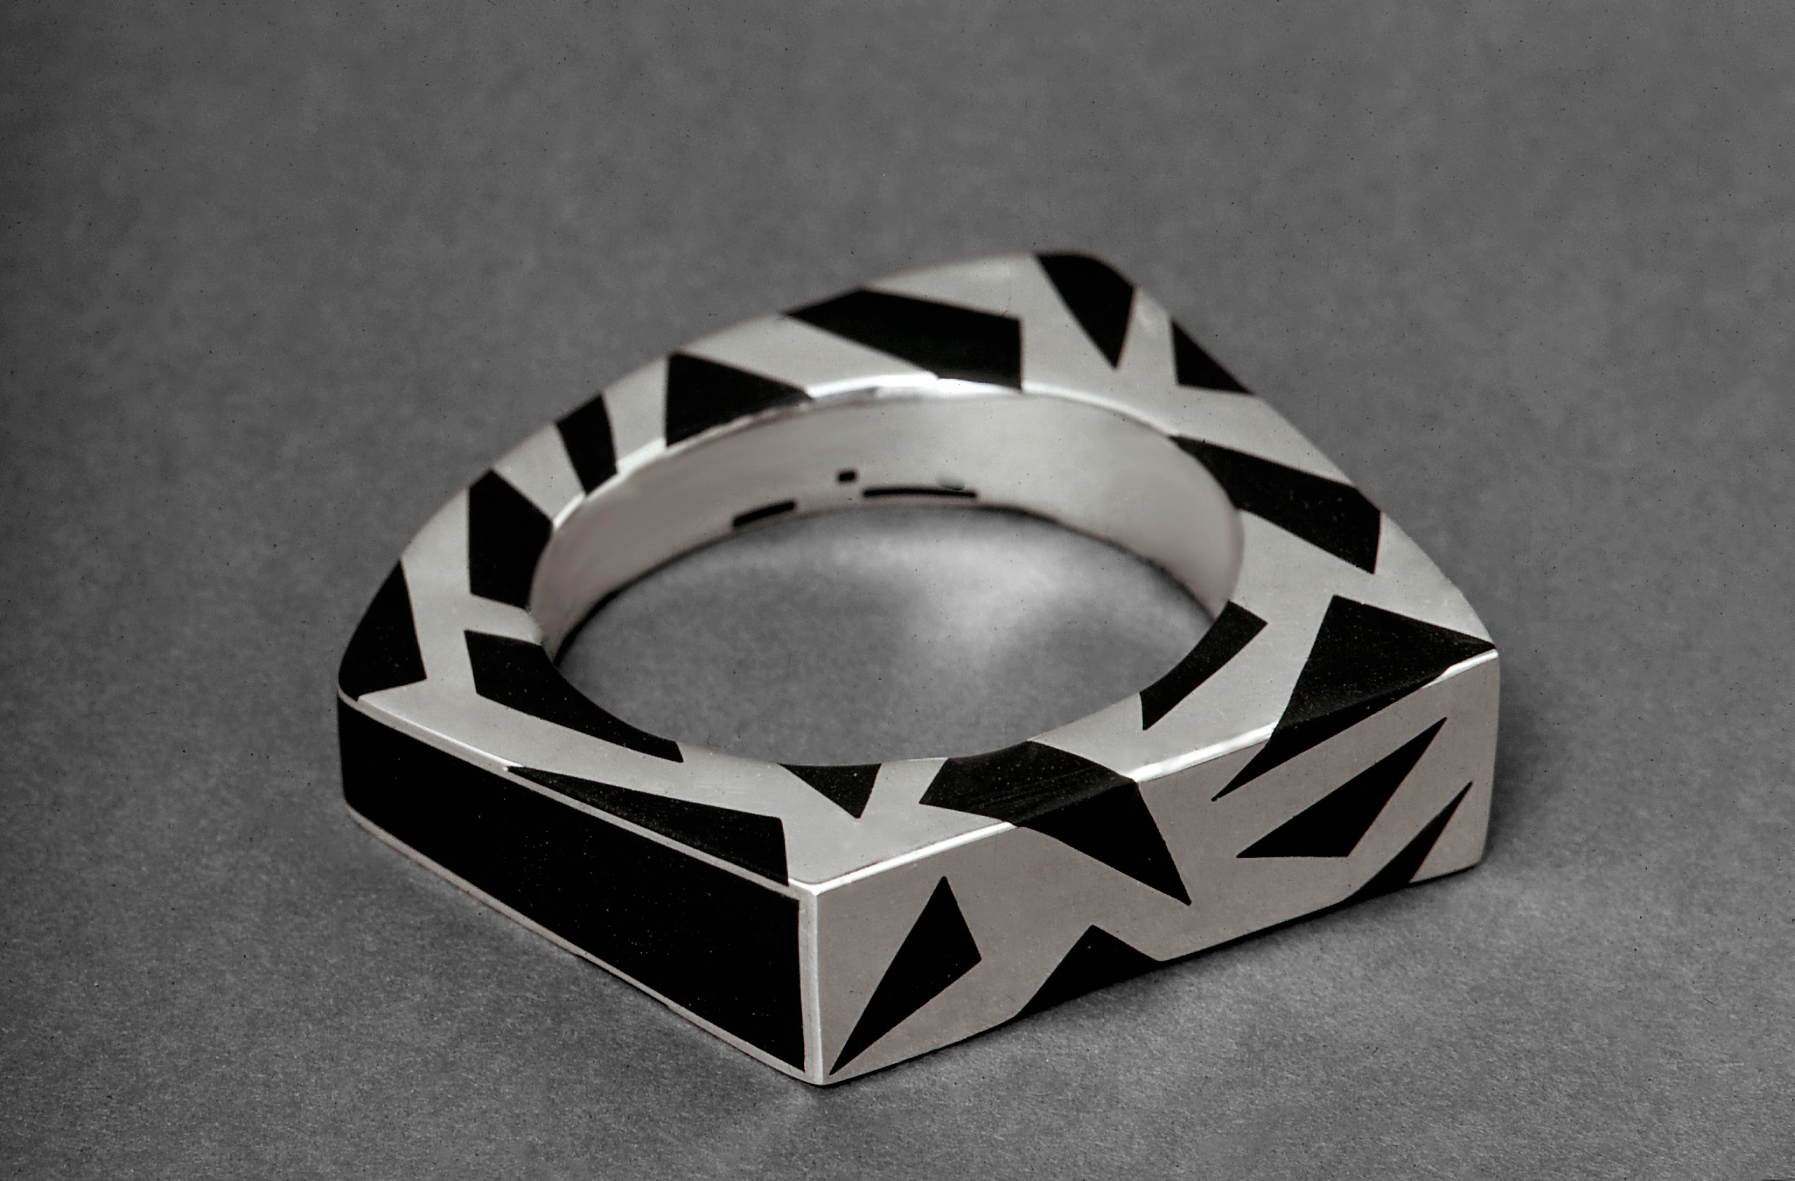 Tereza Seabra, armband, 1969. Foto Bernard Vidal, zilver, ebbehout